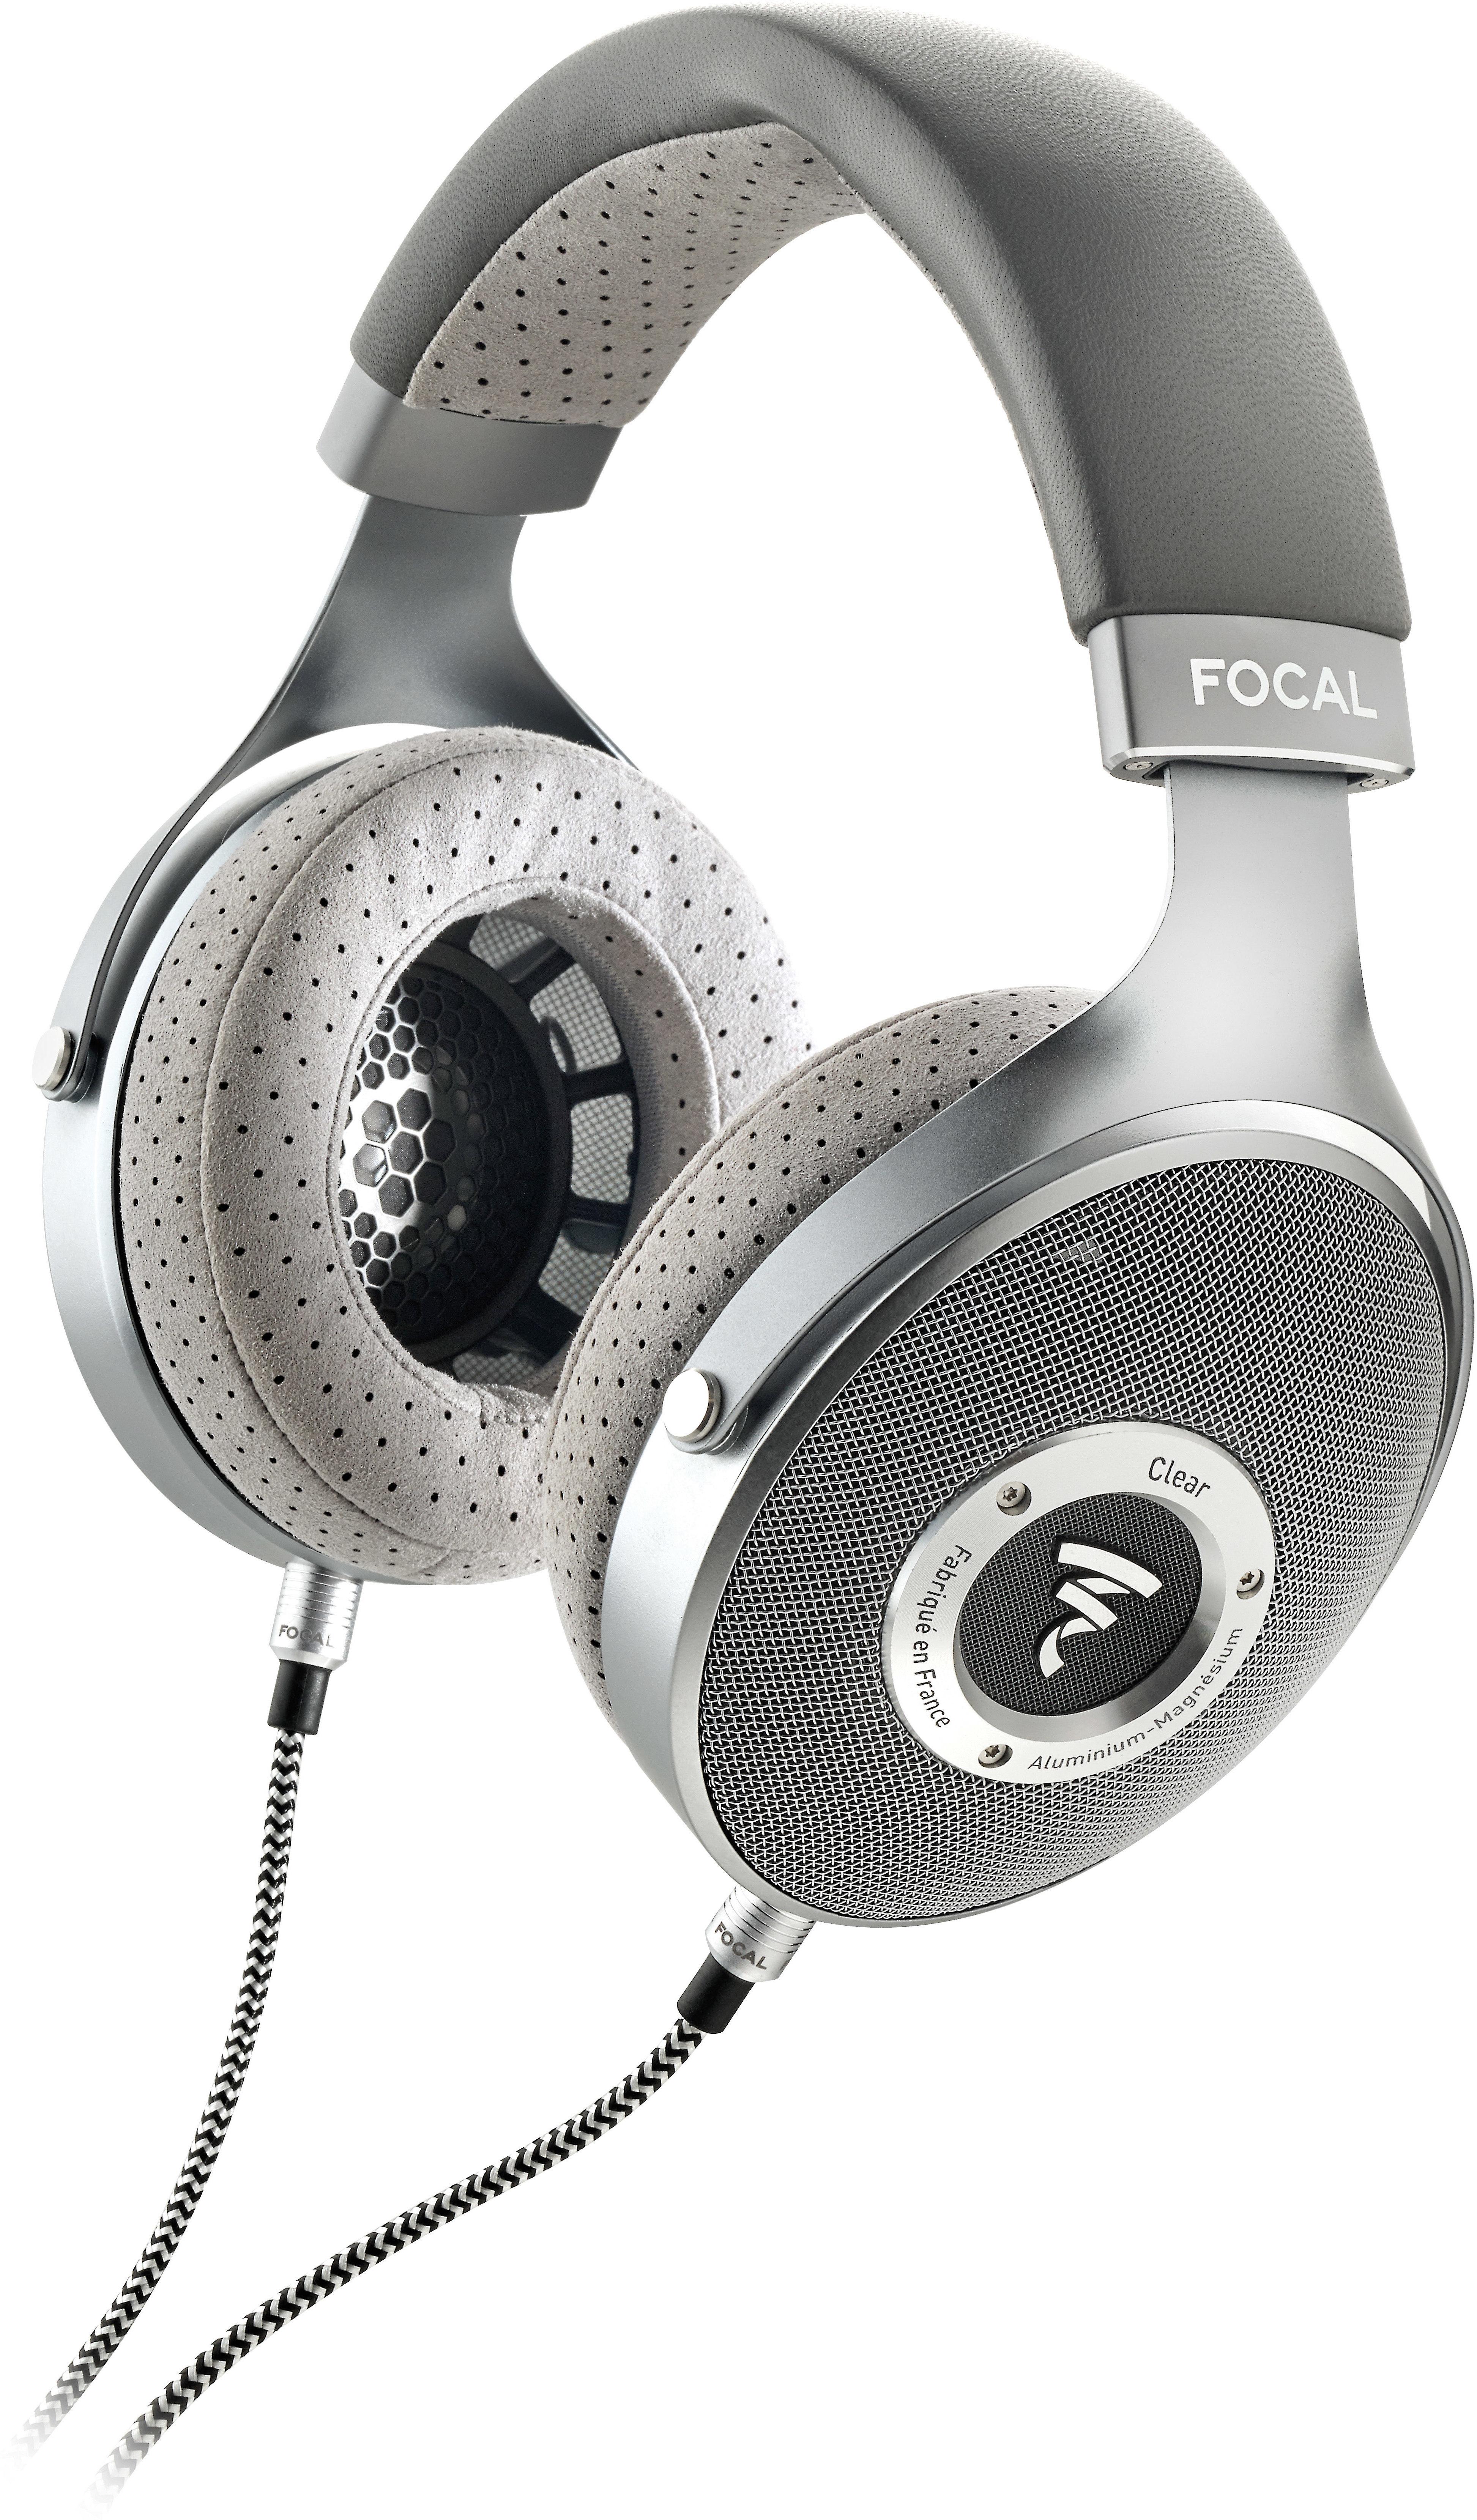 d2217f13eed Focal Clear Open-back over-ear headphones at Crutchfield.com